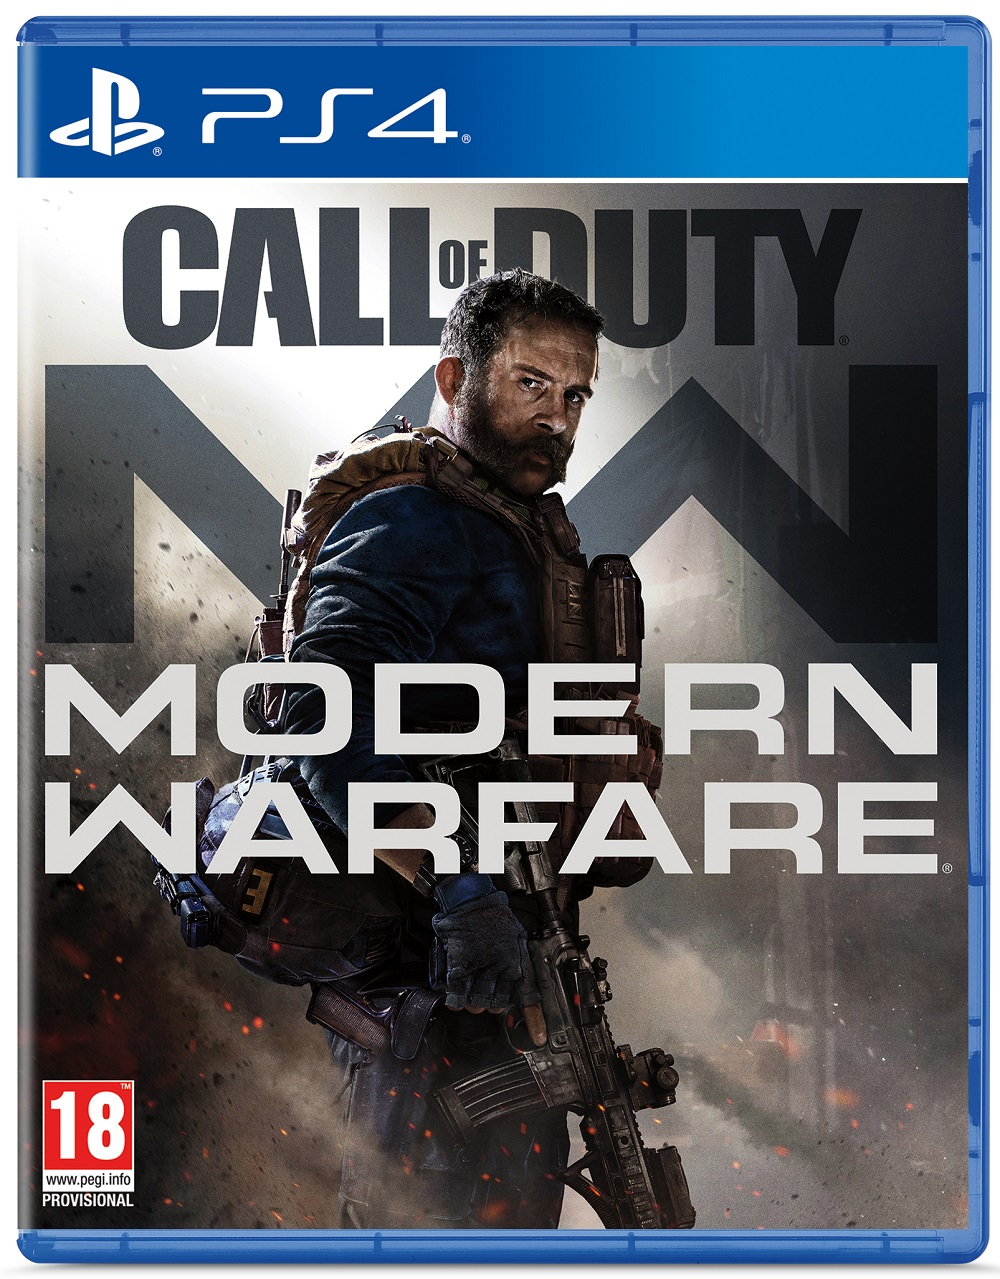 Купить Ігри, Гра Call of Duty Modern Warfare [PS4, Russian version] Blu-ray диск, 88418RU, Sony